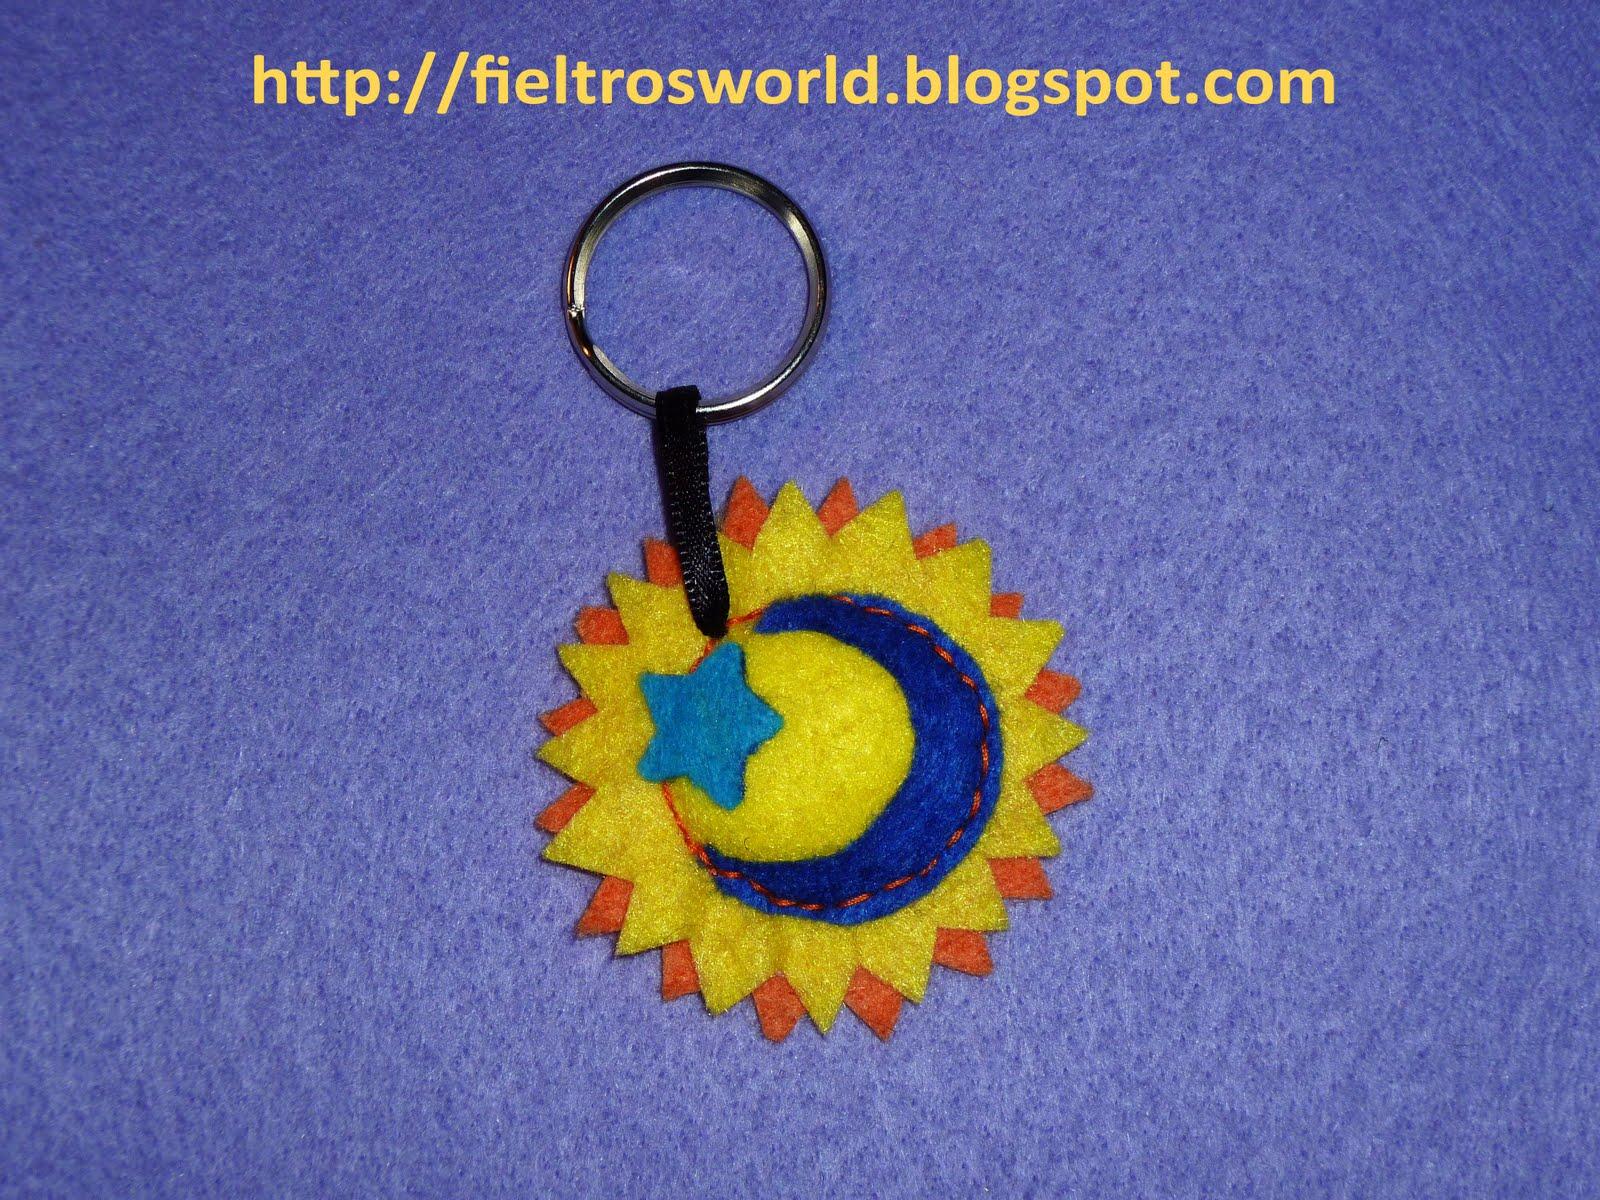 Fieltro's World: Llavero Sol-Luna